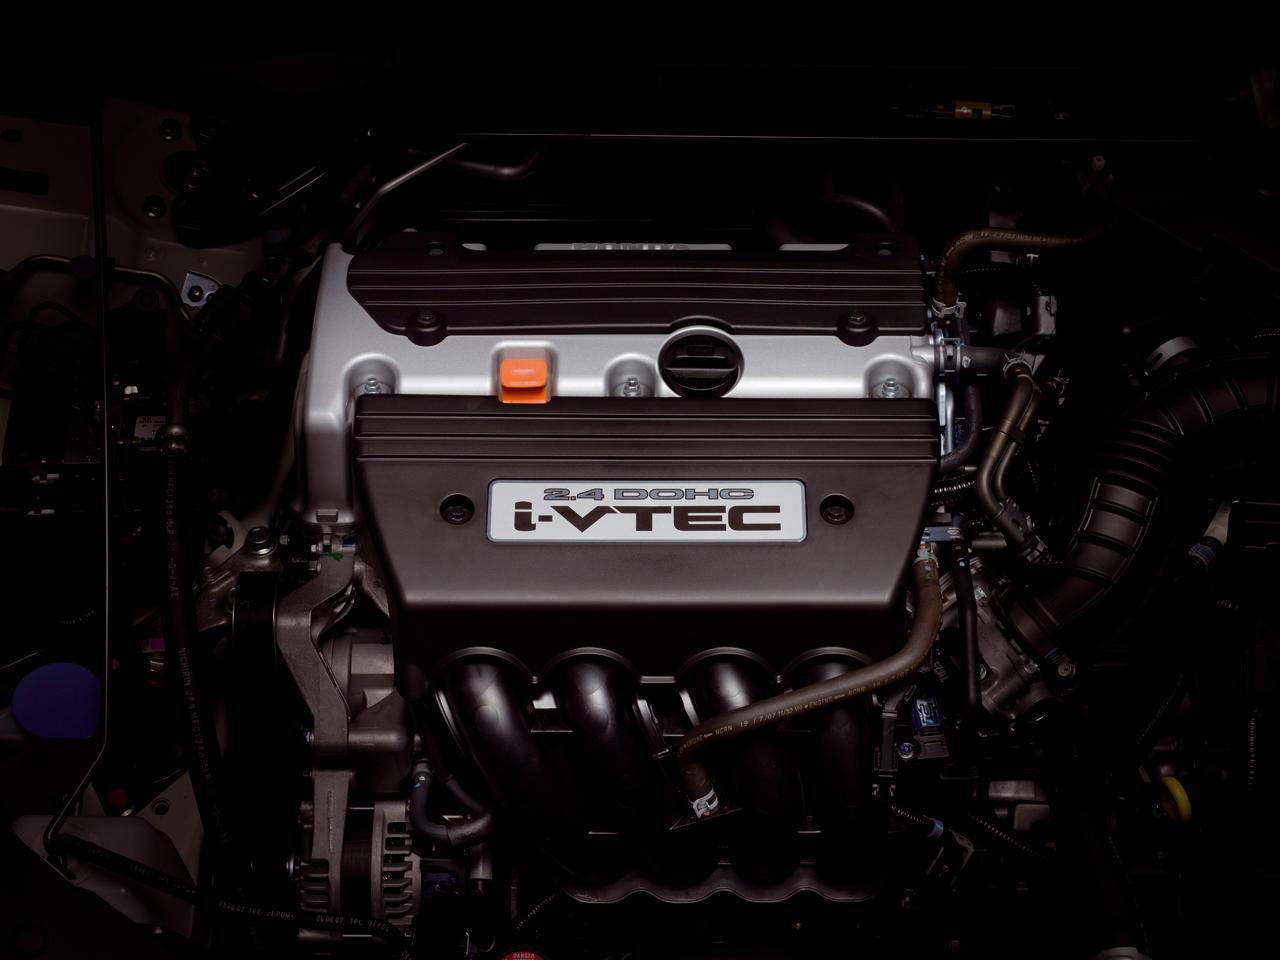 Honda S Vtec System Explained Autoevolution